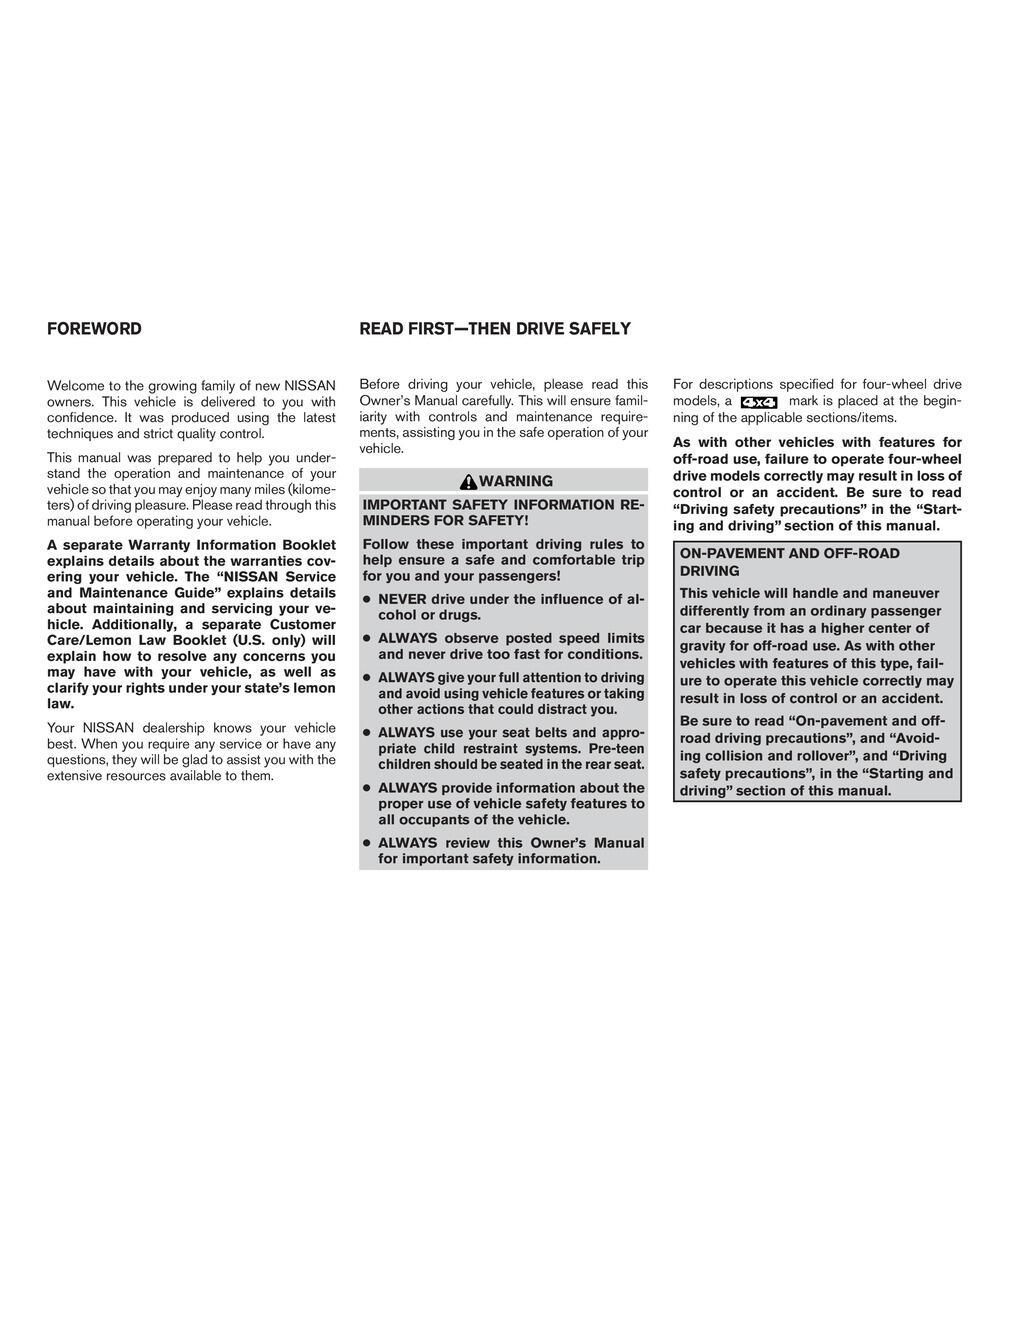 2009 Nissan Xterra owners manual